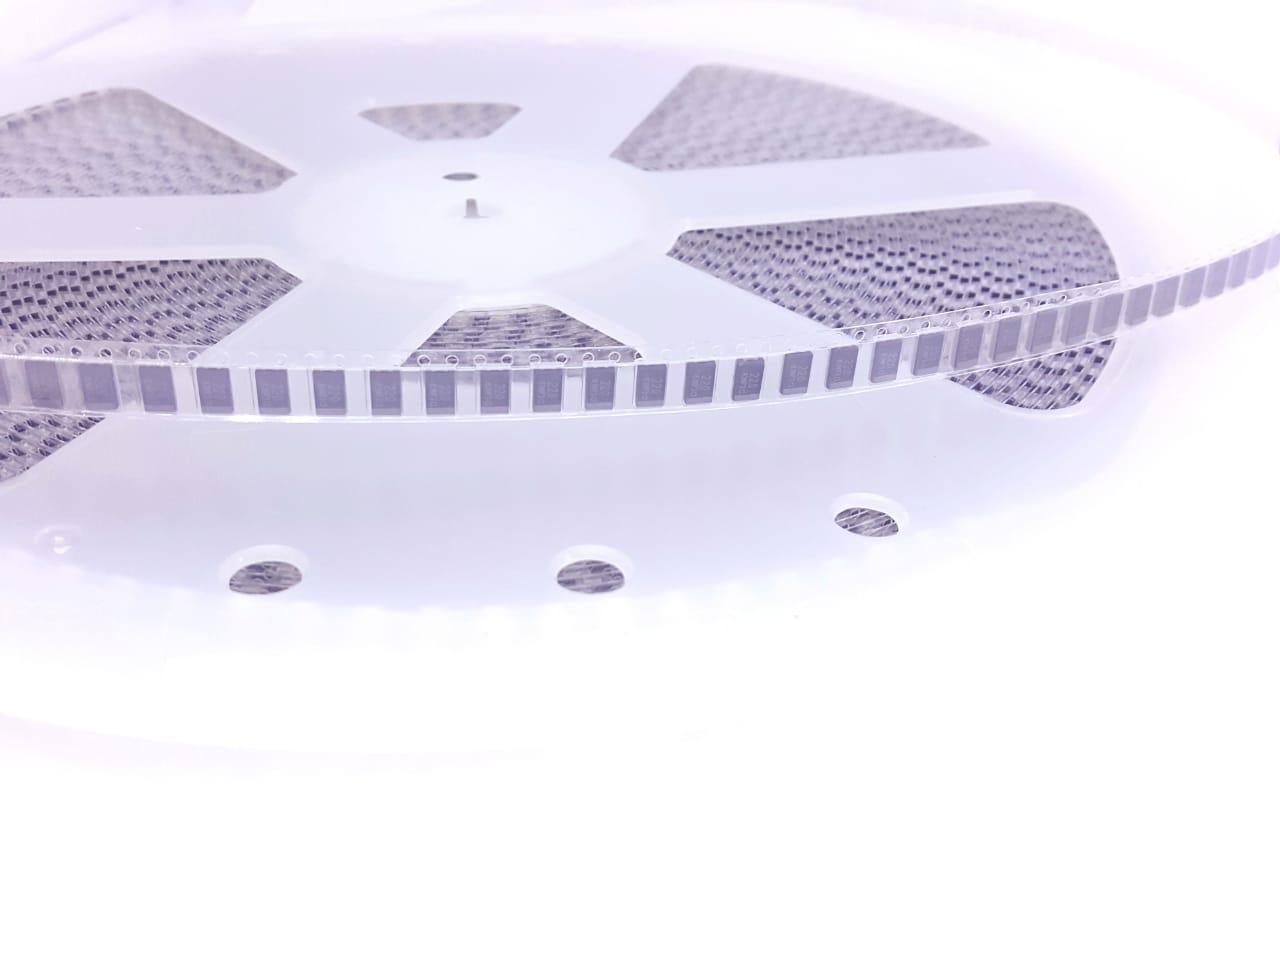 10 peças Capacitor Polymer Tântalo 220 UF x 2 V Panasonic